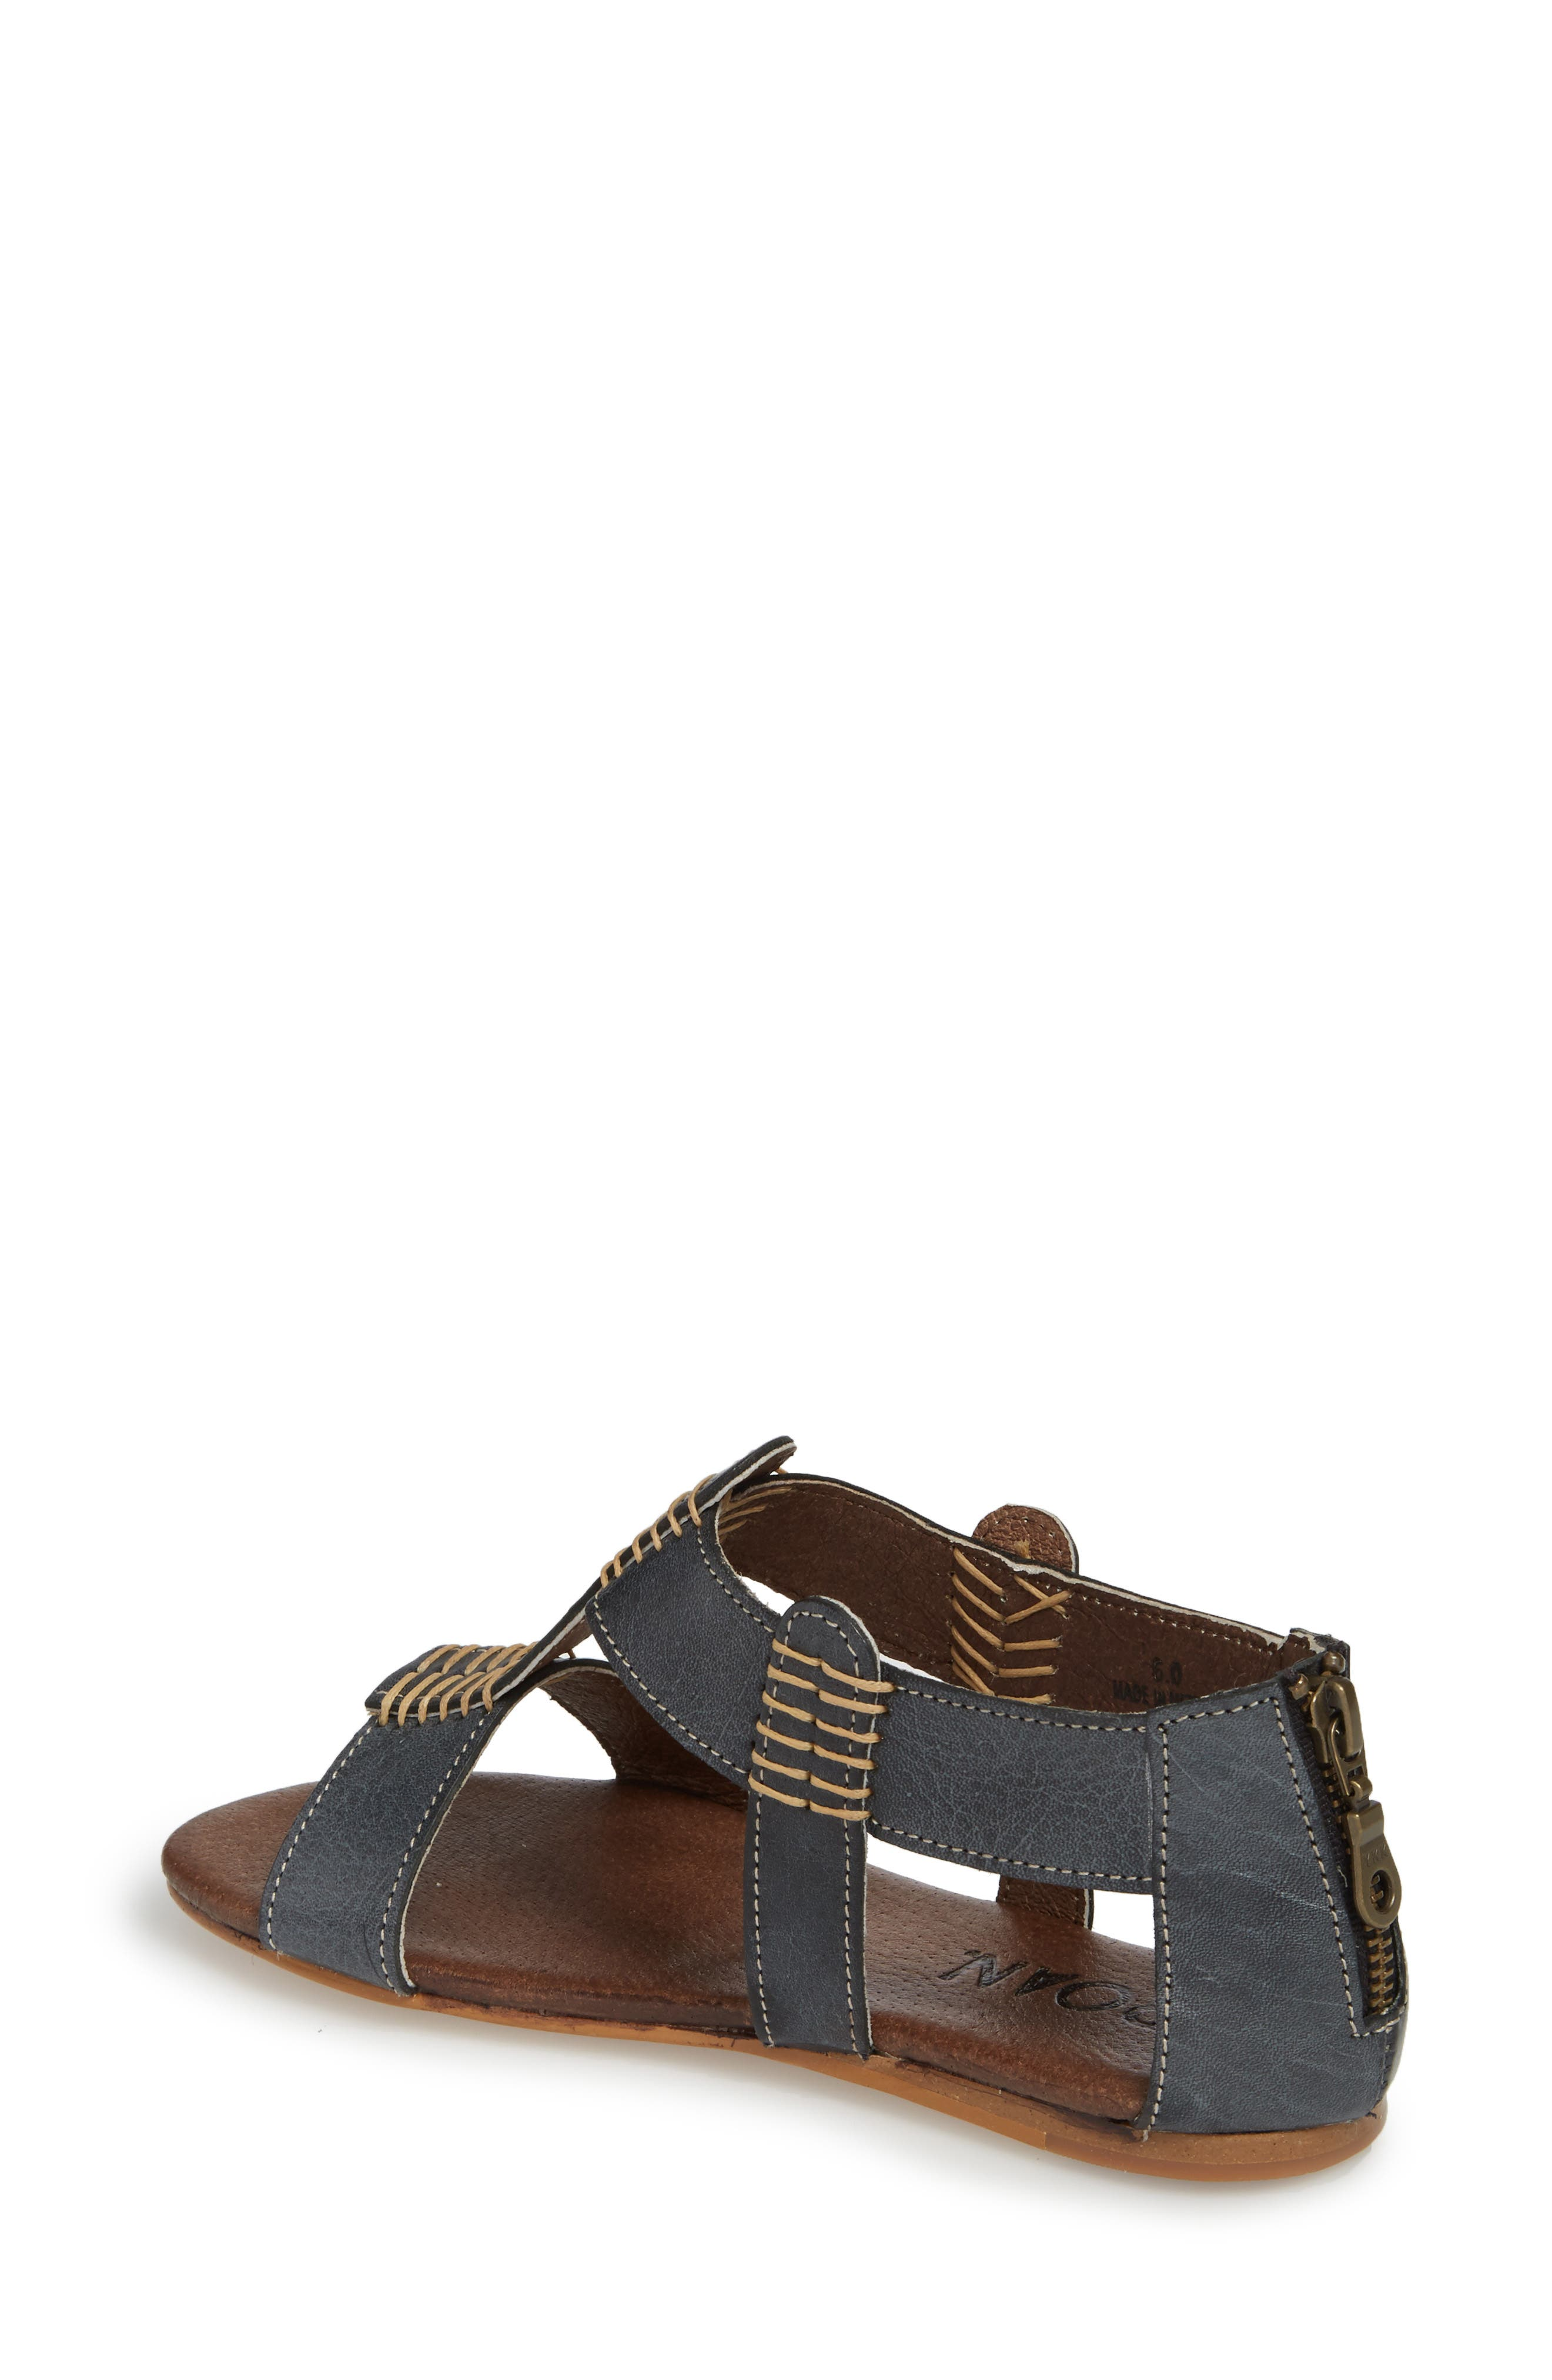 Jocelyn T-Strap Flat Sandal,                             Alternate thumbnail 2, color,                             Sydney Black